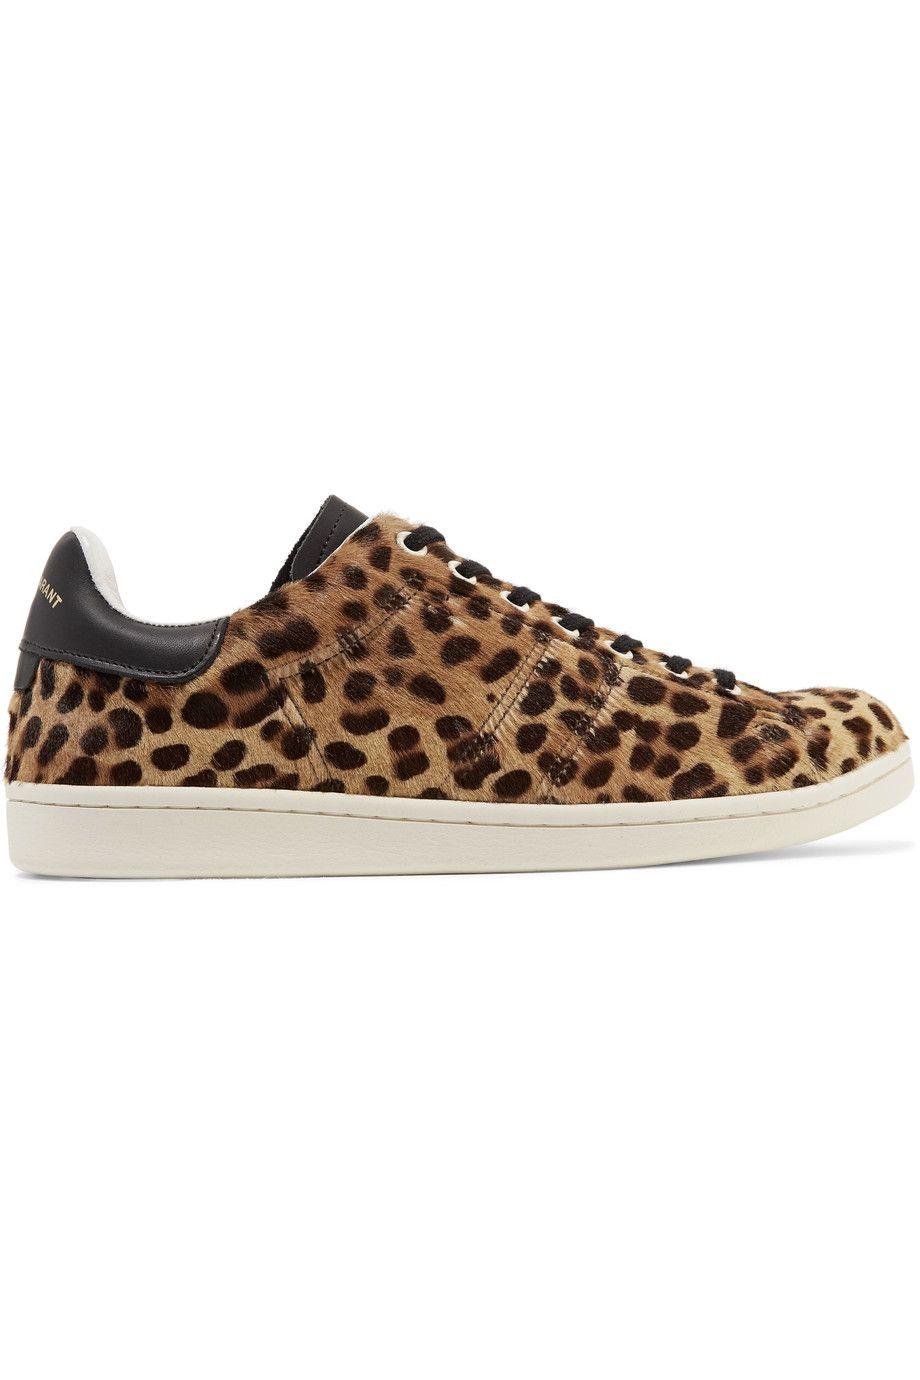 ETOILE ISABEL MARANT Bart Leopard-Print Calf Hair Sneakers.  #etoileisabelmarant #shoes #